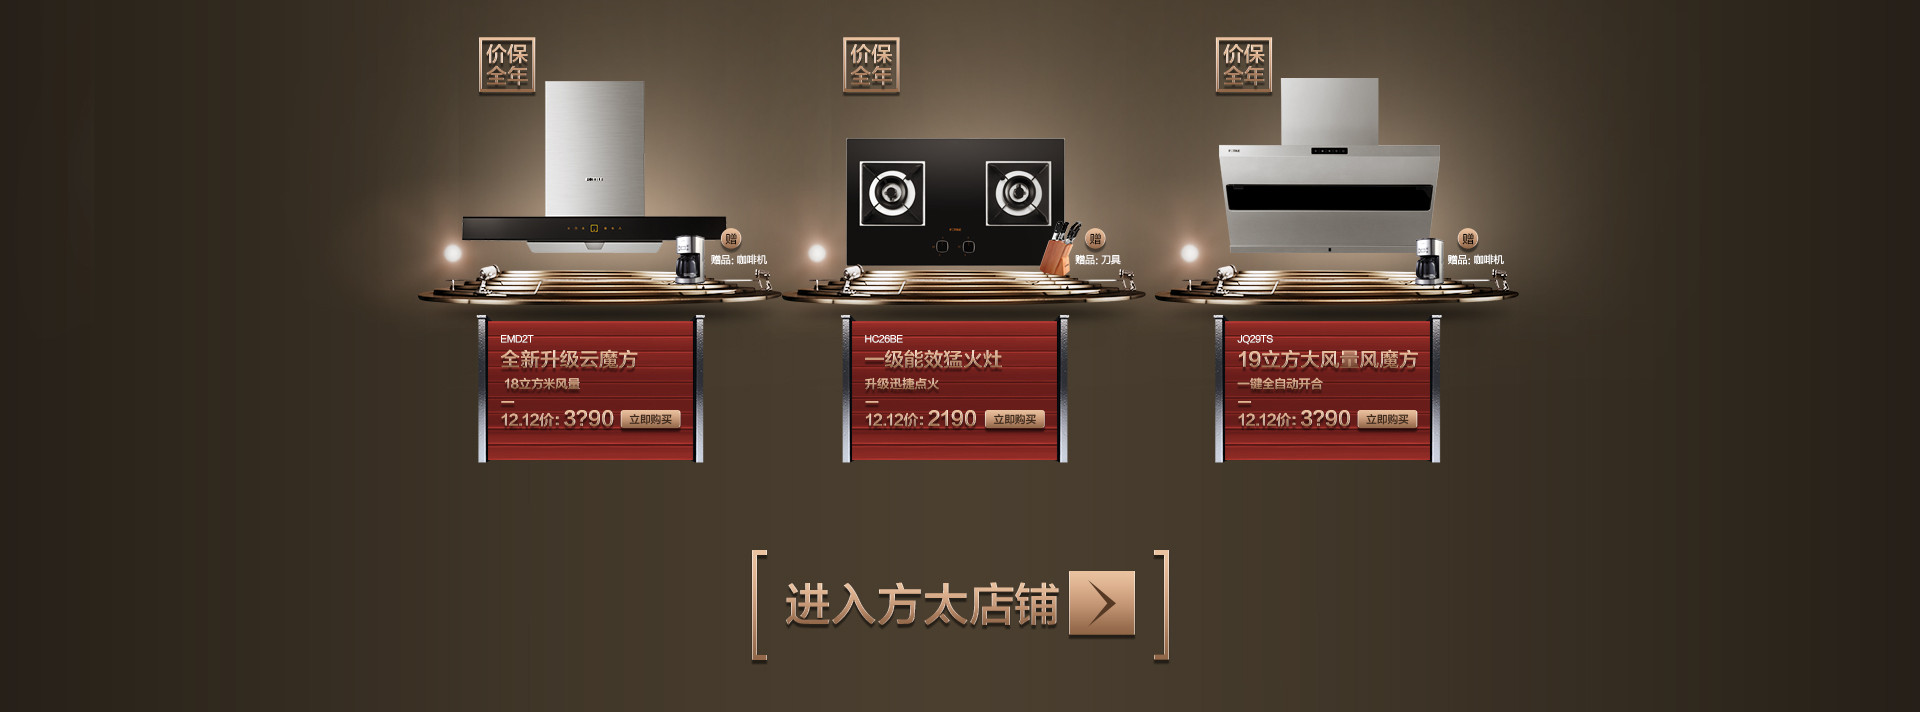 http://image.suning.cn/uimg/sop/commodity/213193433310861029365945_x.jpg